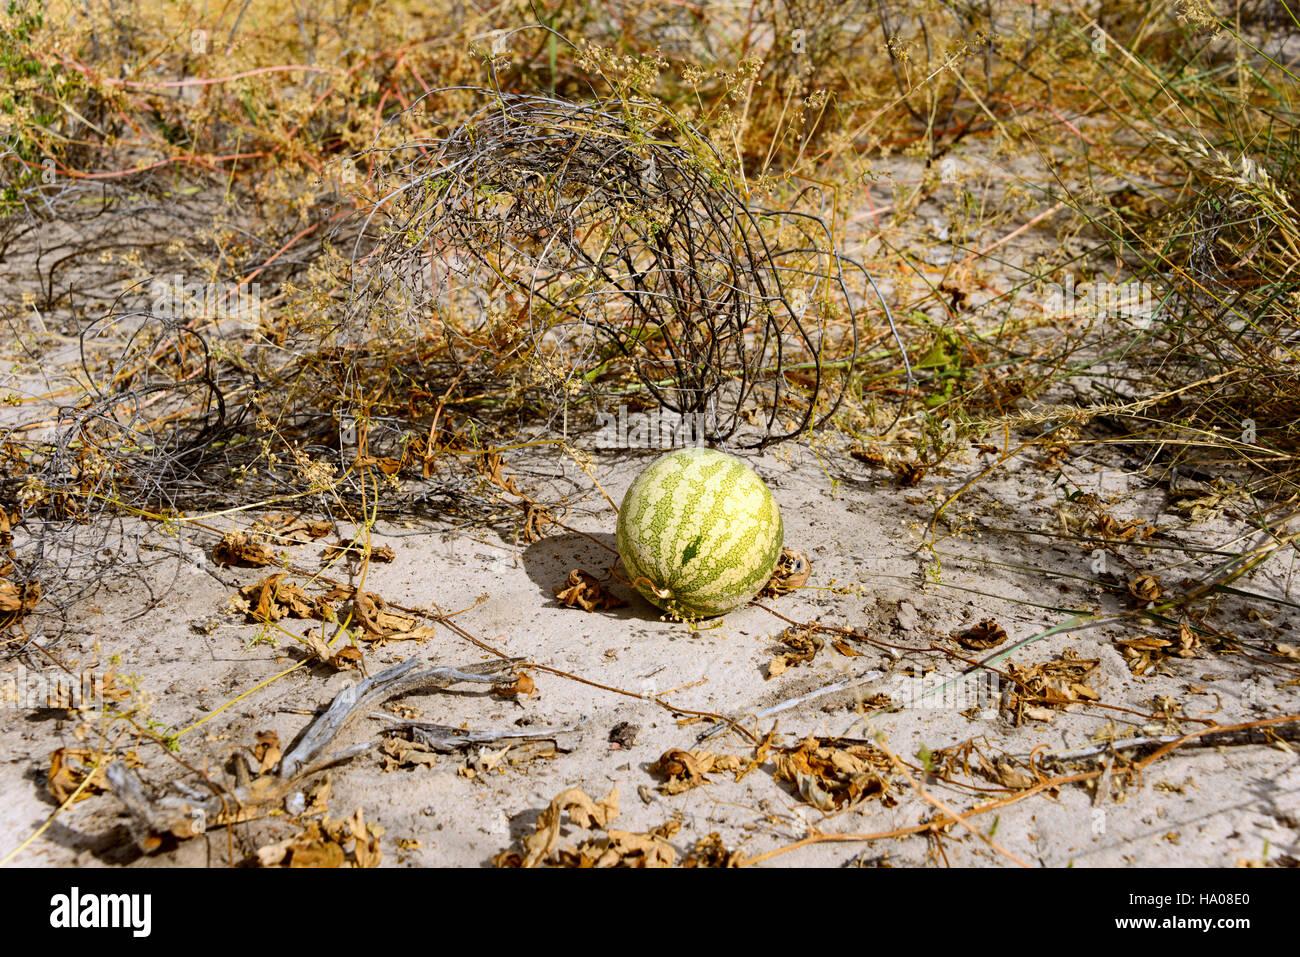 Namib tsamma (Citruilius ecirrhosus) in Central Kalahari Game Reserve, Botswana - Stock Image